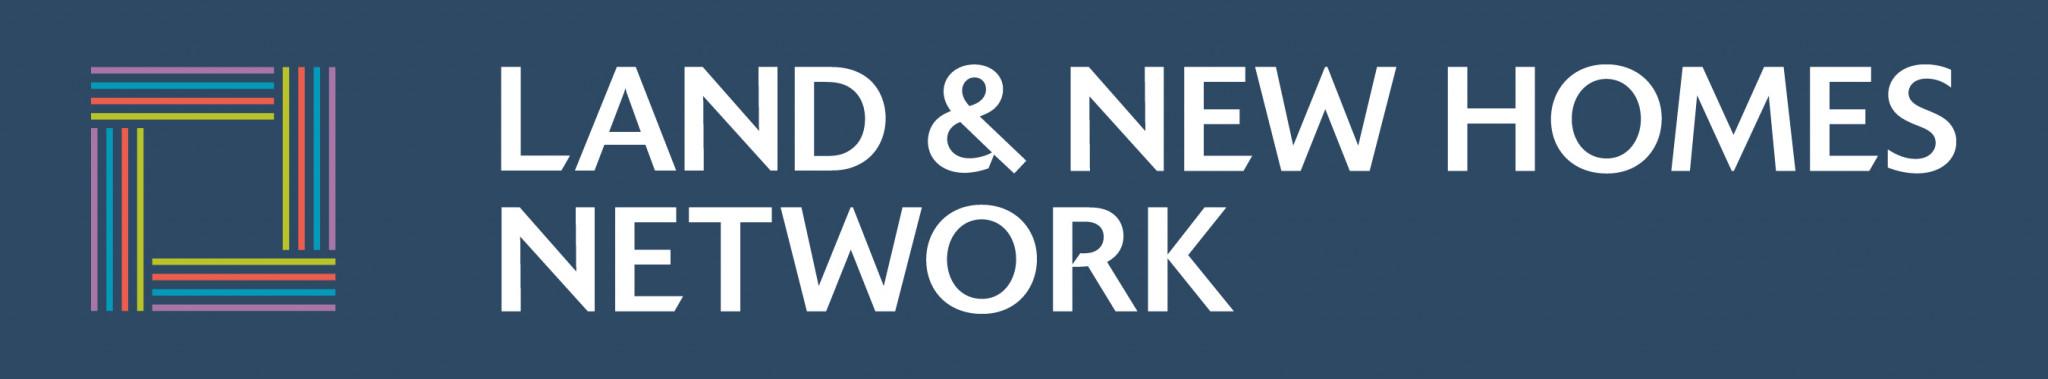 image_l&nhn_logo_rgb_reversed